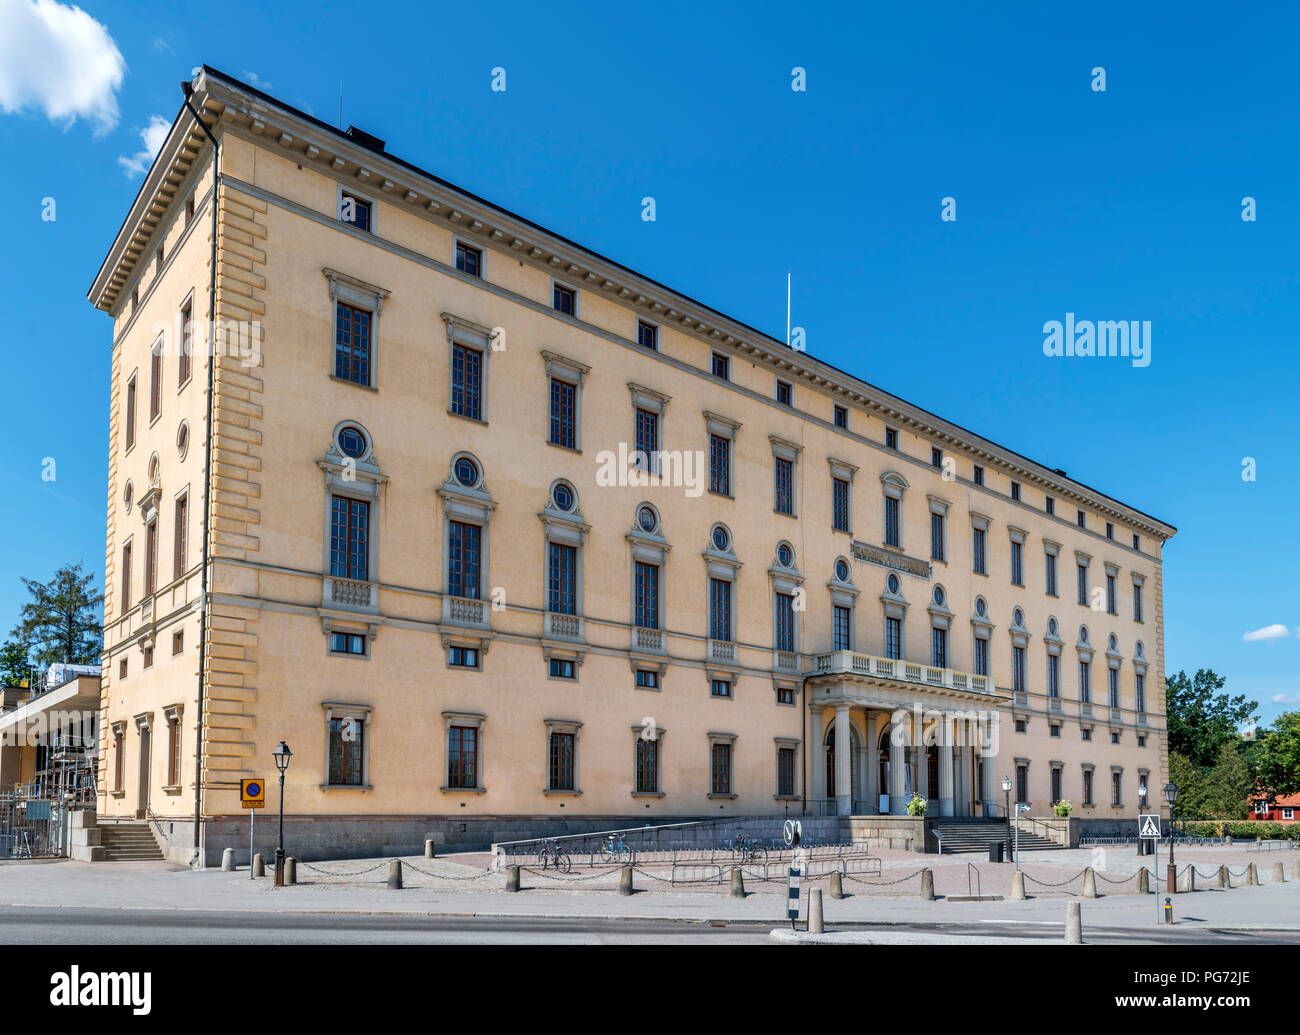 Carolina Redviva Library, Uppsala University, Uppsala, Uppland, Sweden Stock Photo